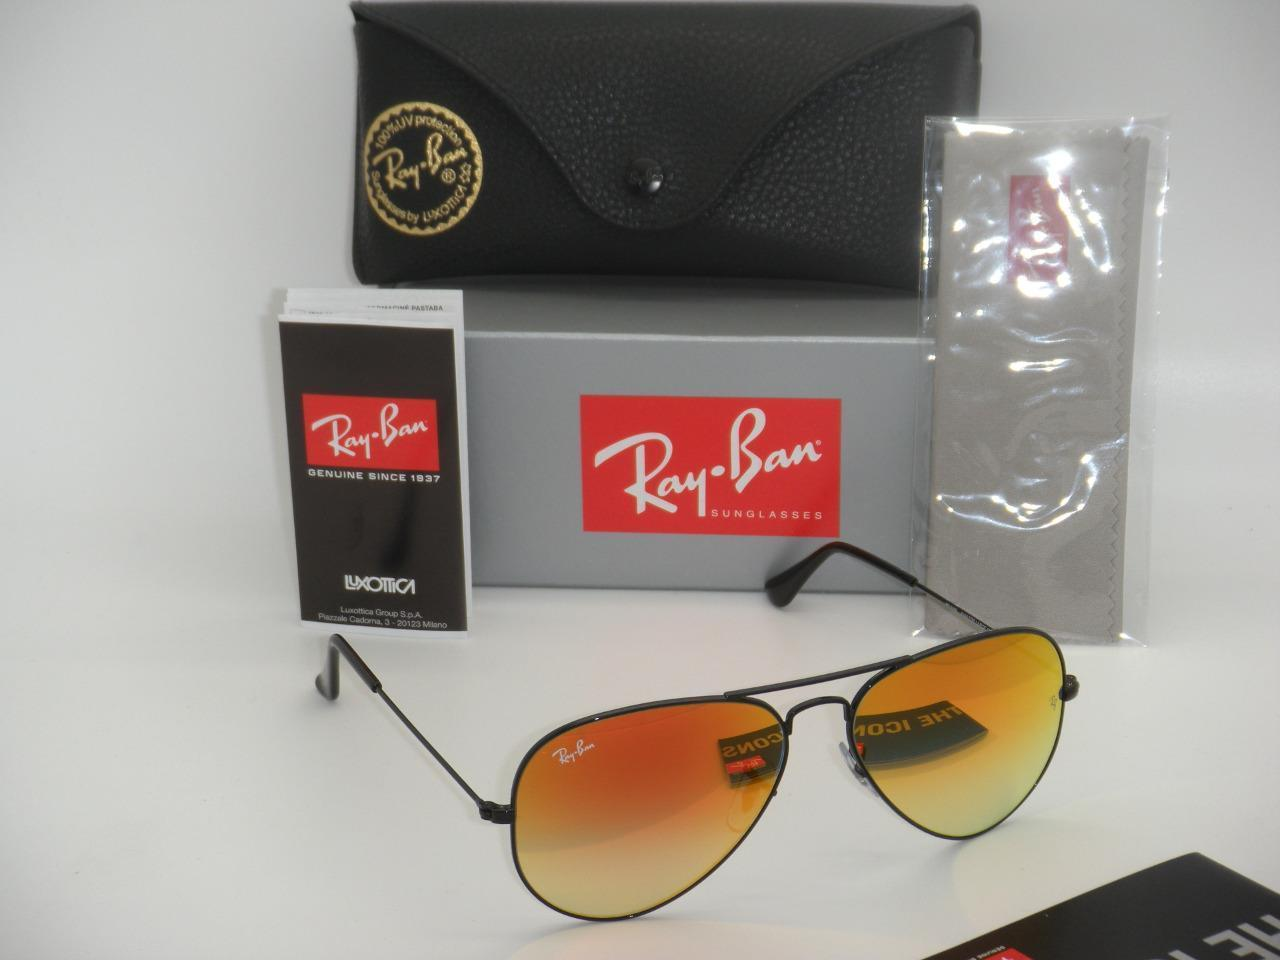 Ray Ban Aviator RB3025 002/4W 58mm Black Frame Green Gradient Mirror